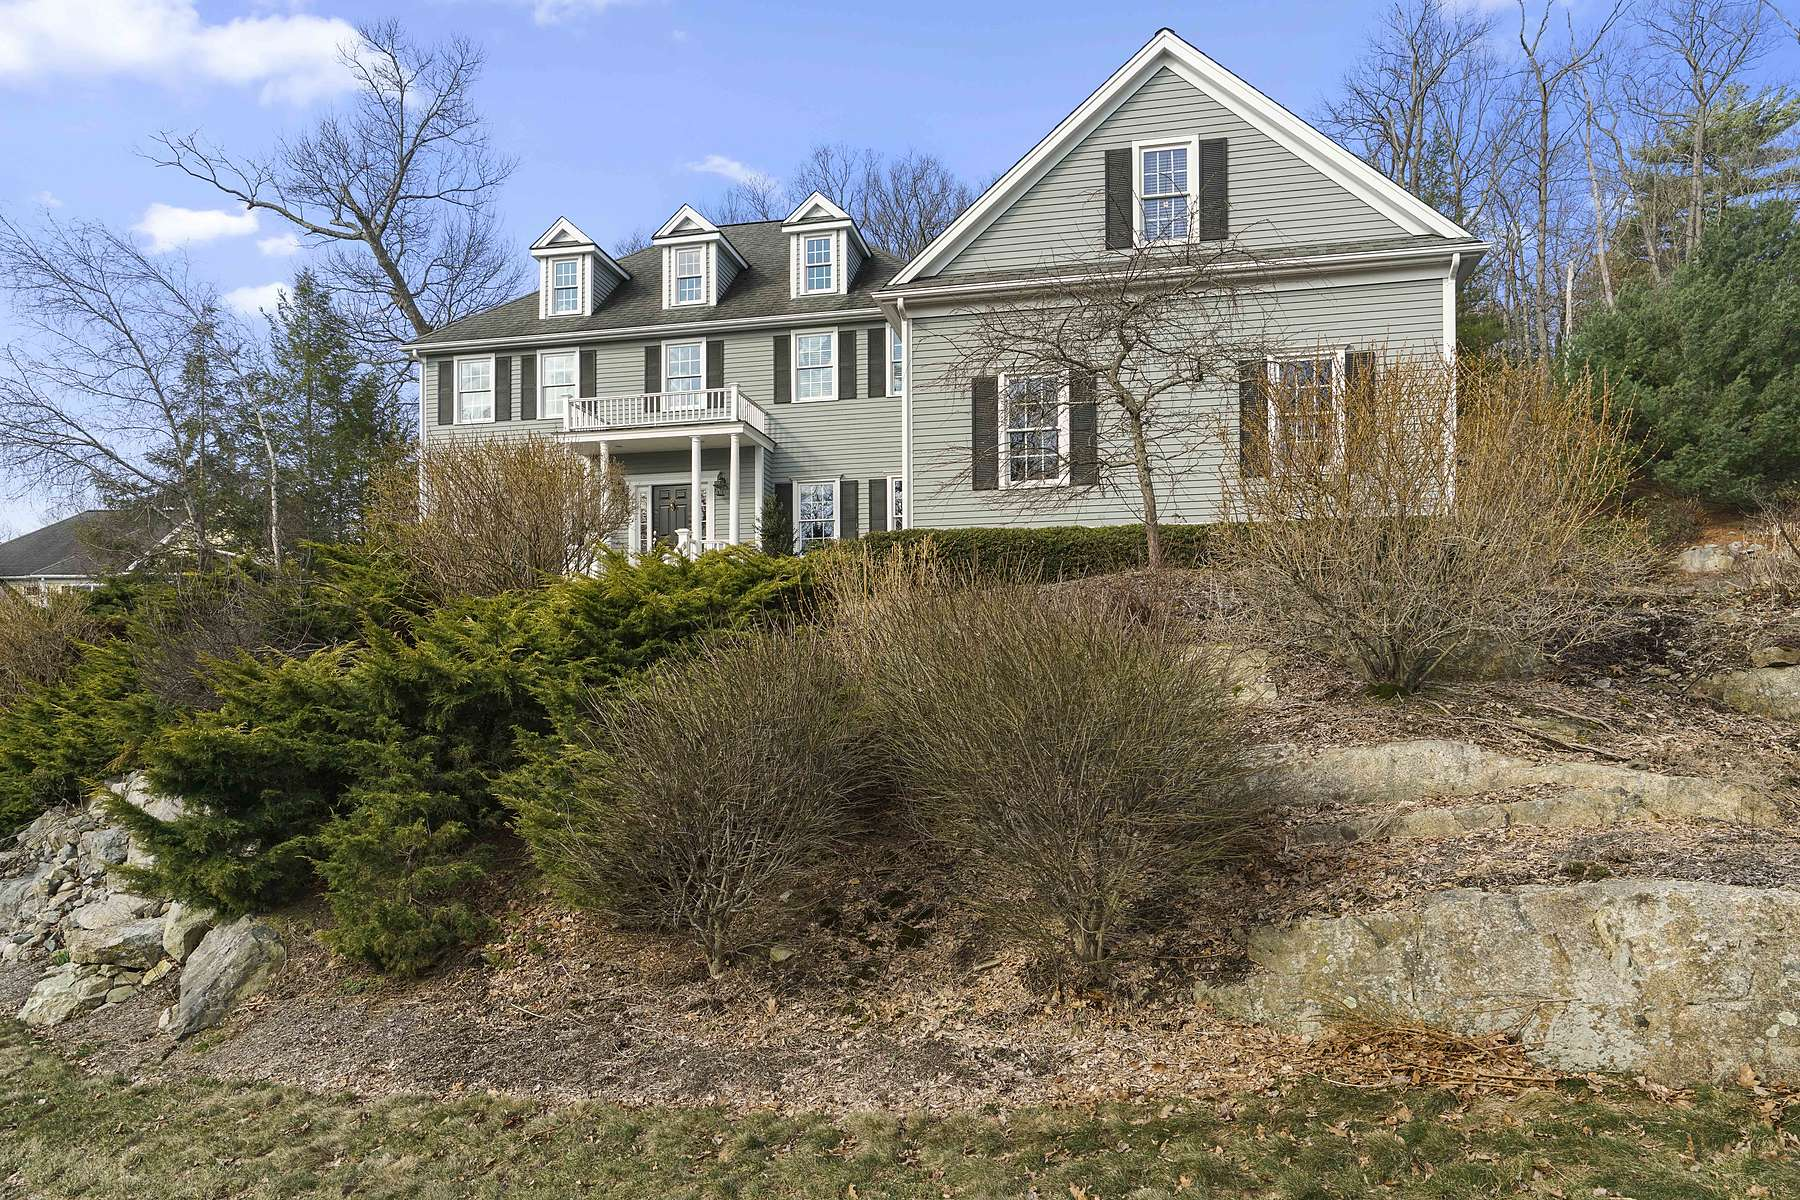 Single Family Home for Active at 30 Deerpath Road, Dedham 30 Deerpath Road Dedham, Massachusetts 02026 United States